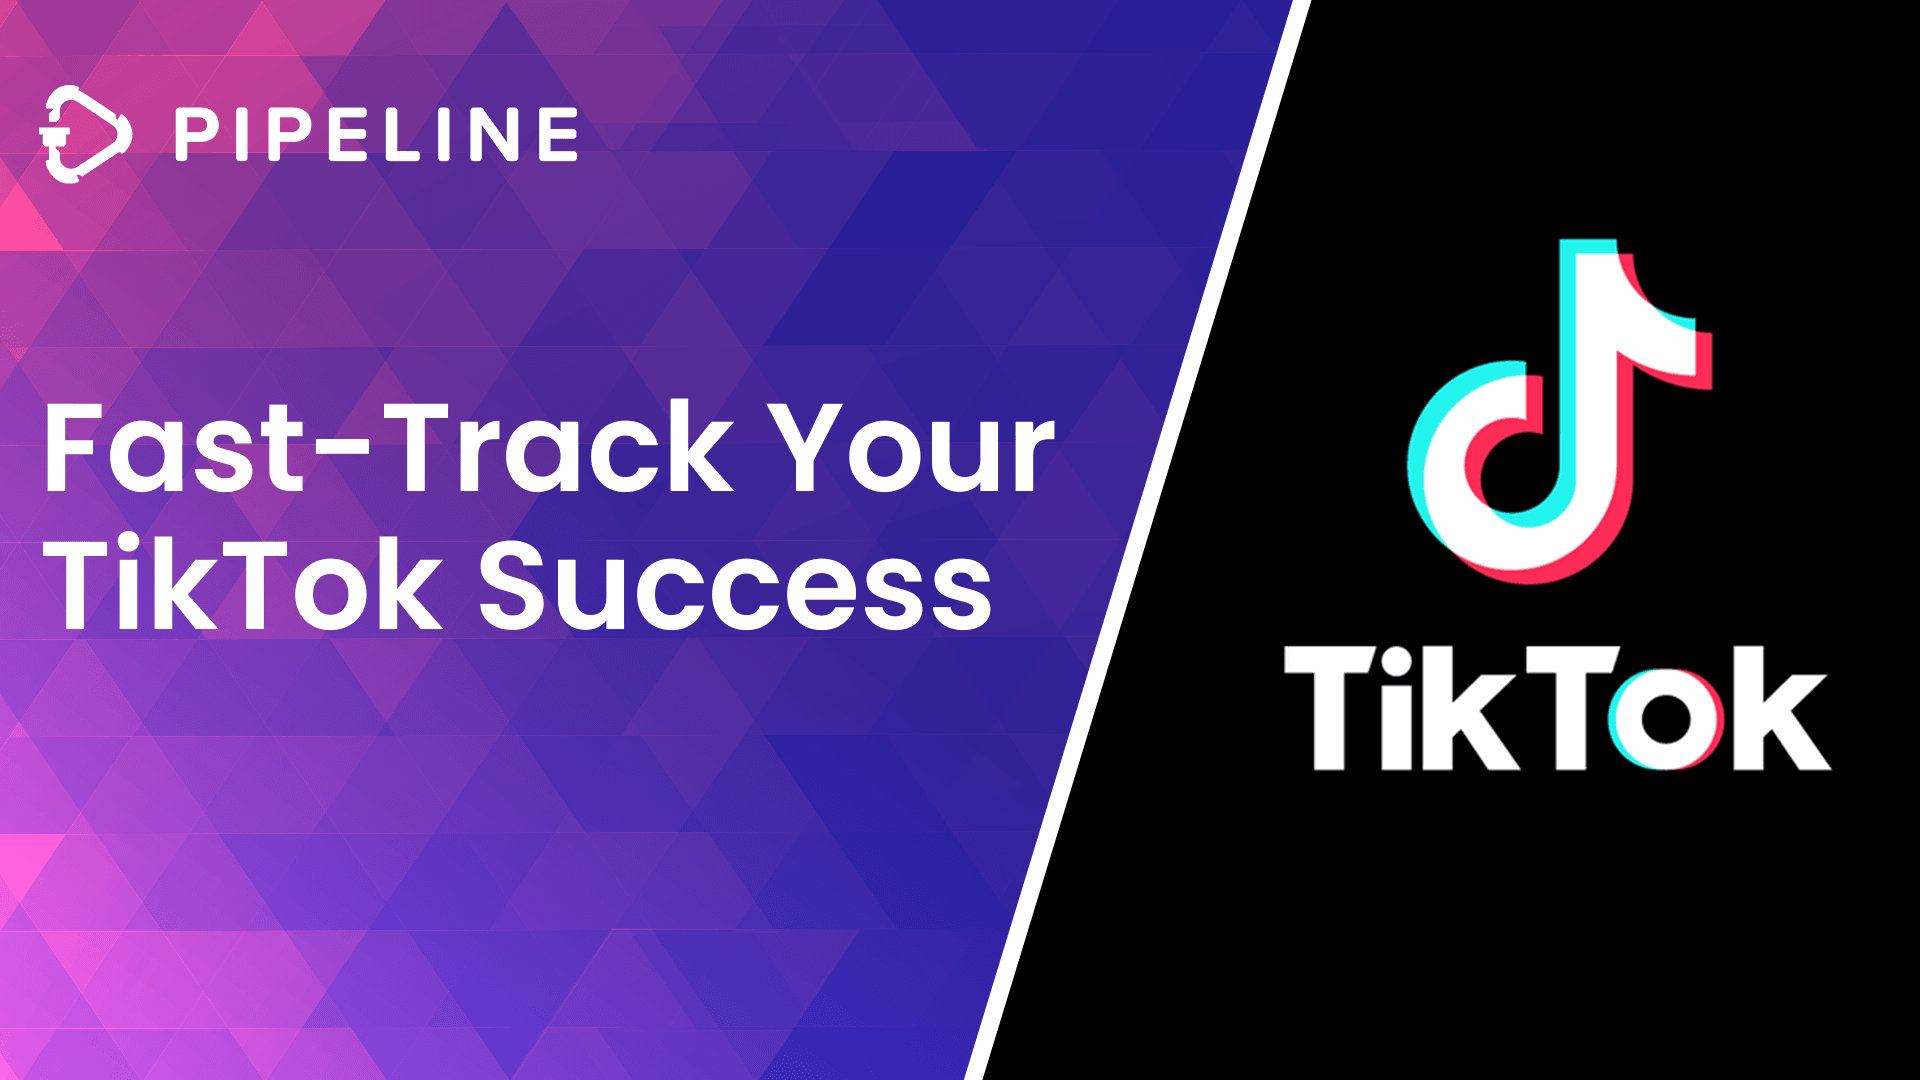 Fast-Track Your TikTok Success